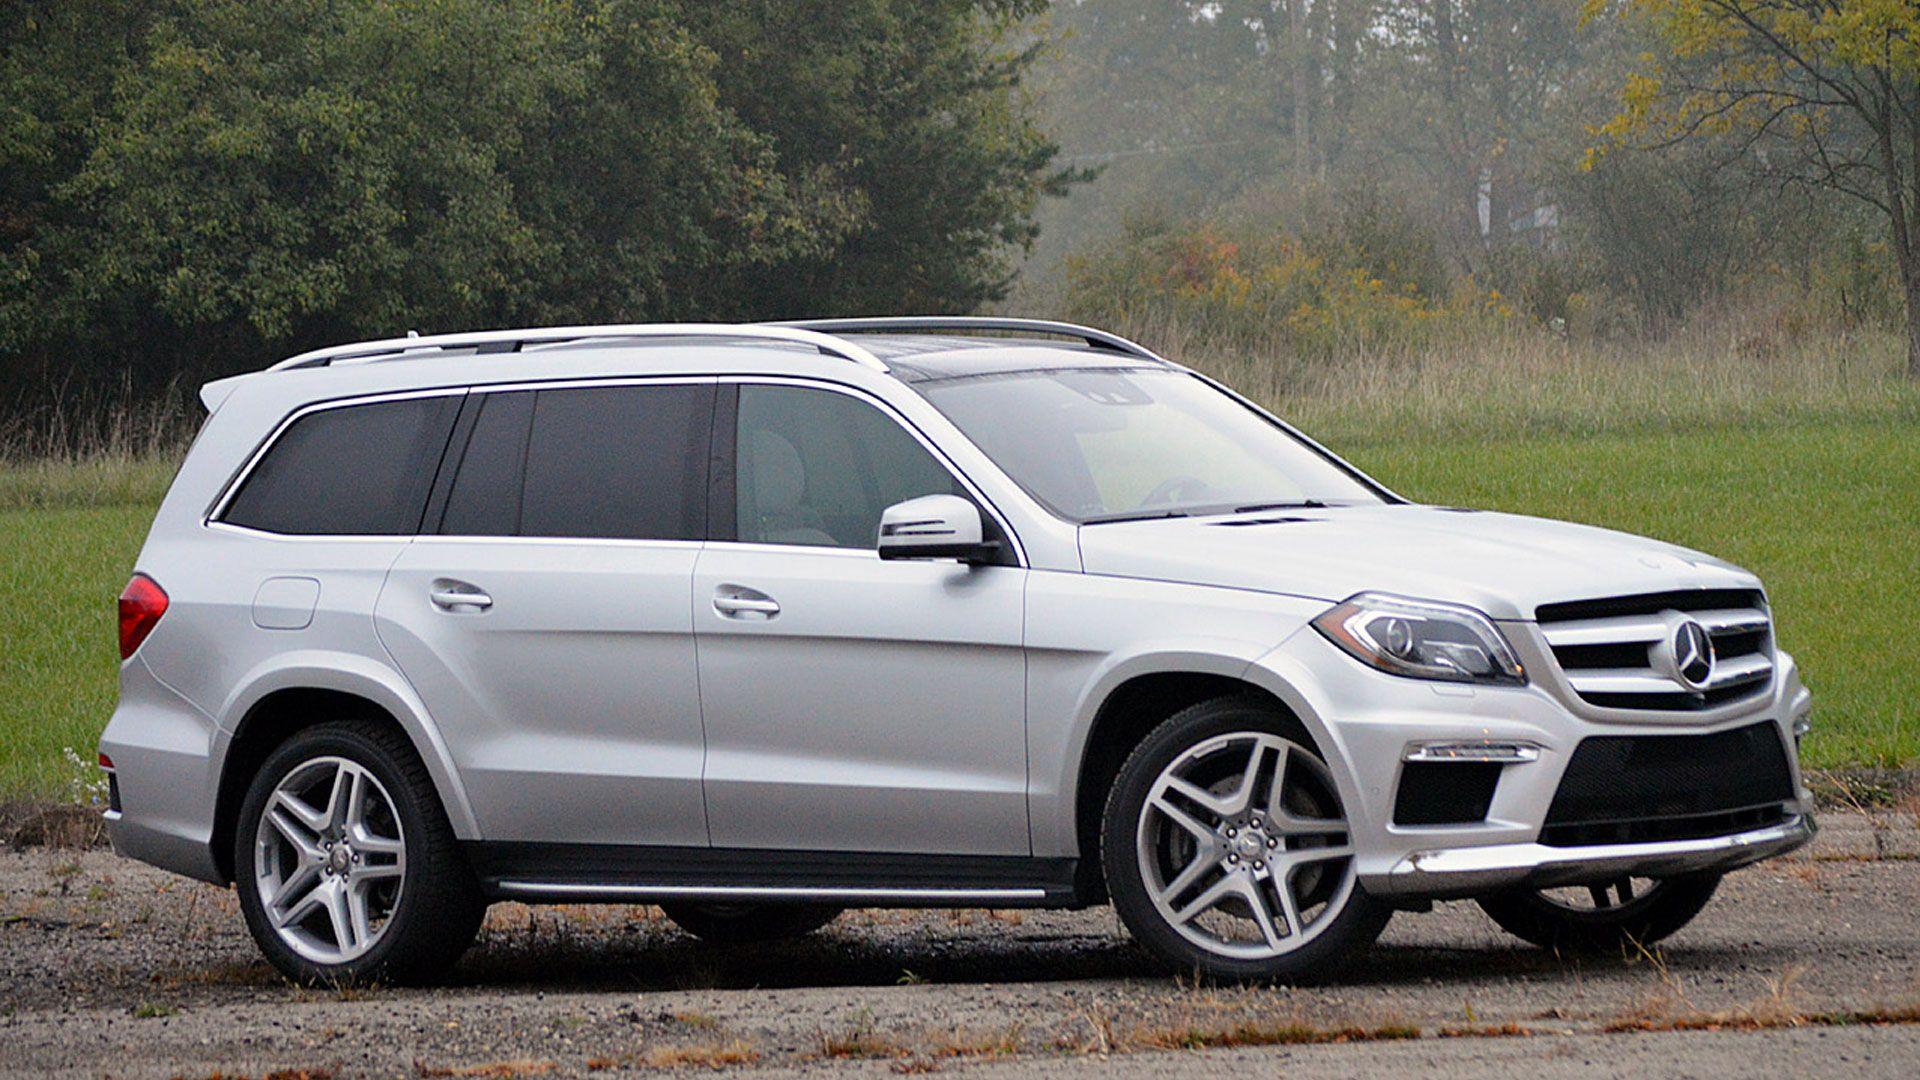 mercedes benz gl550 hd wallpaper - White Mercedes Suv 2013